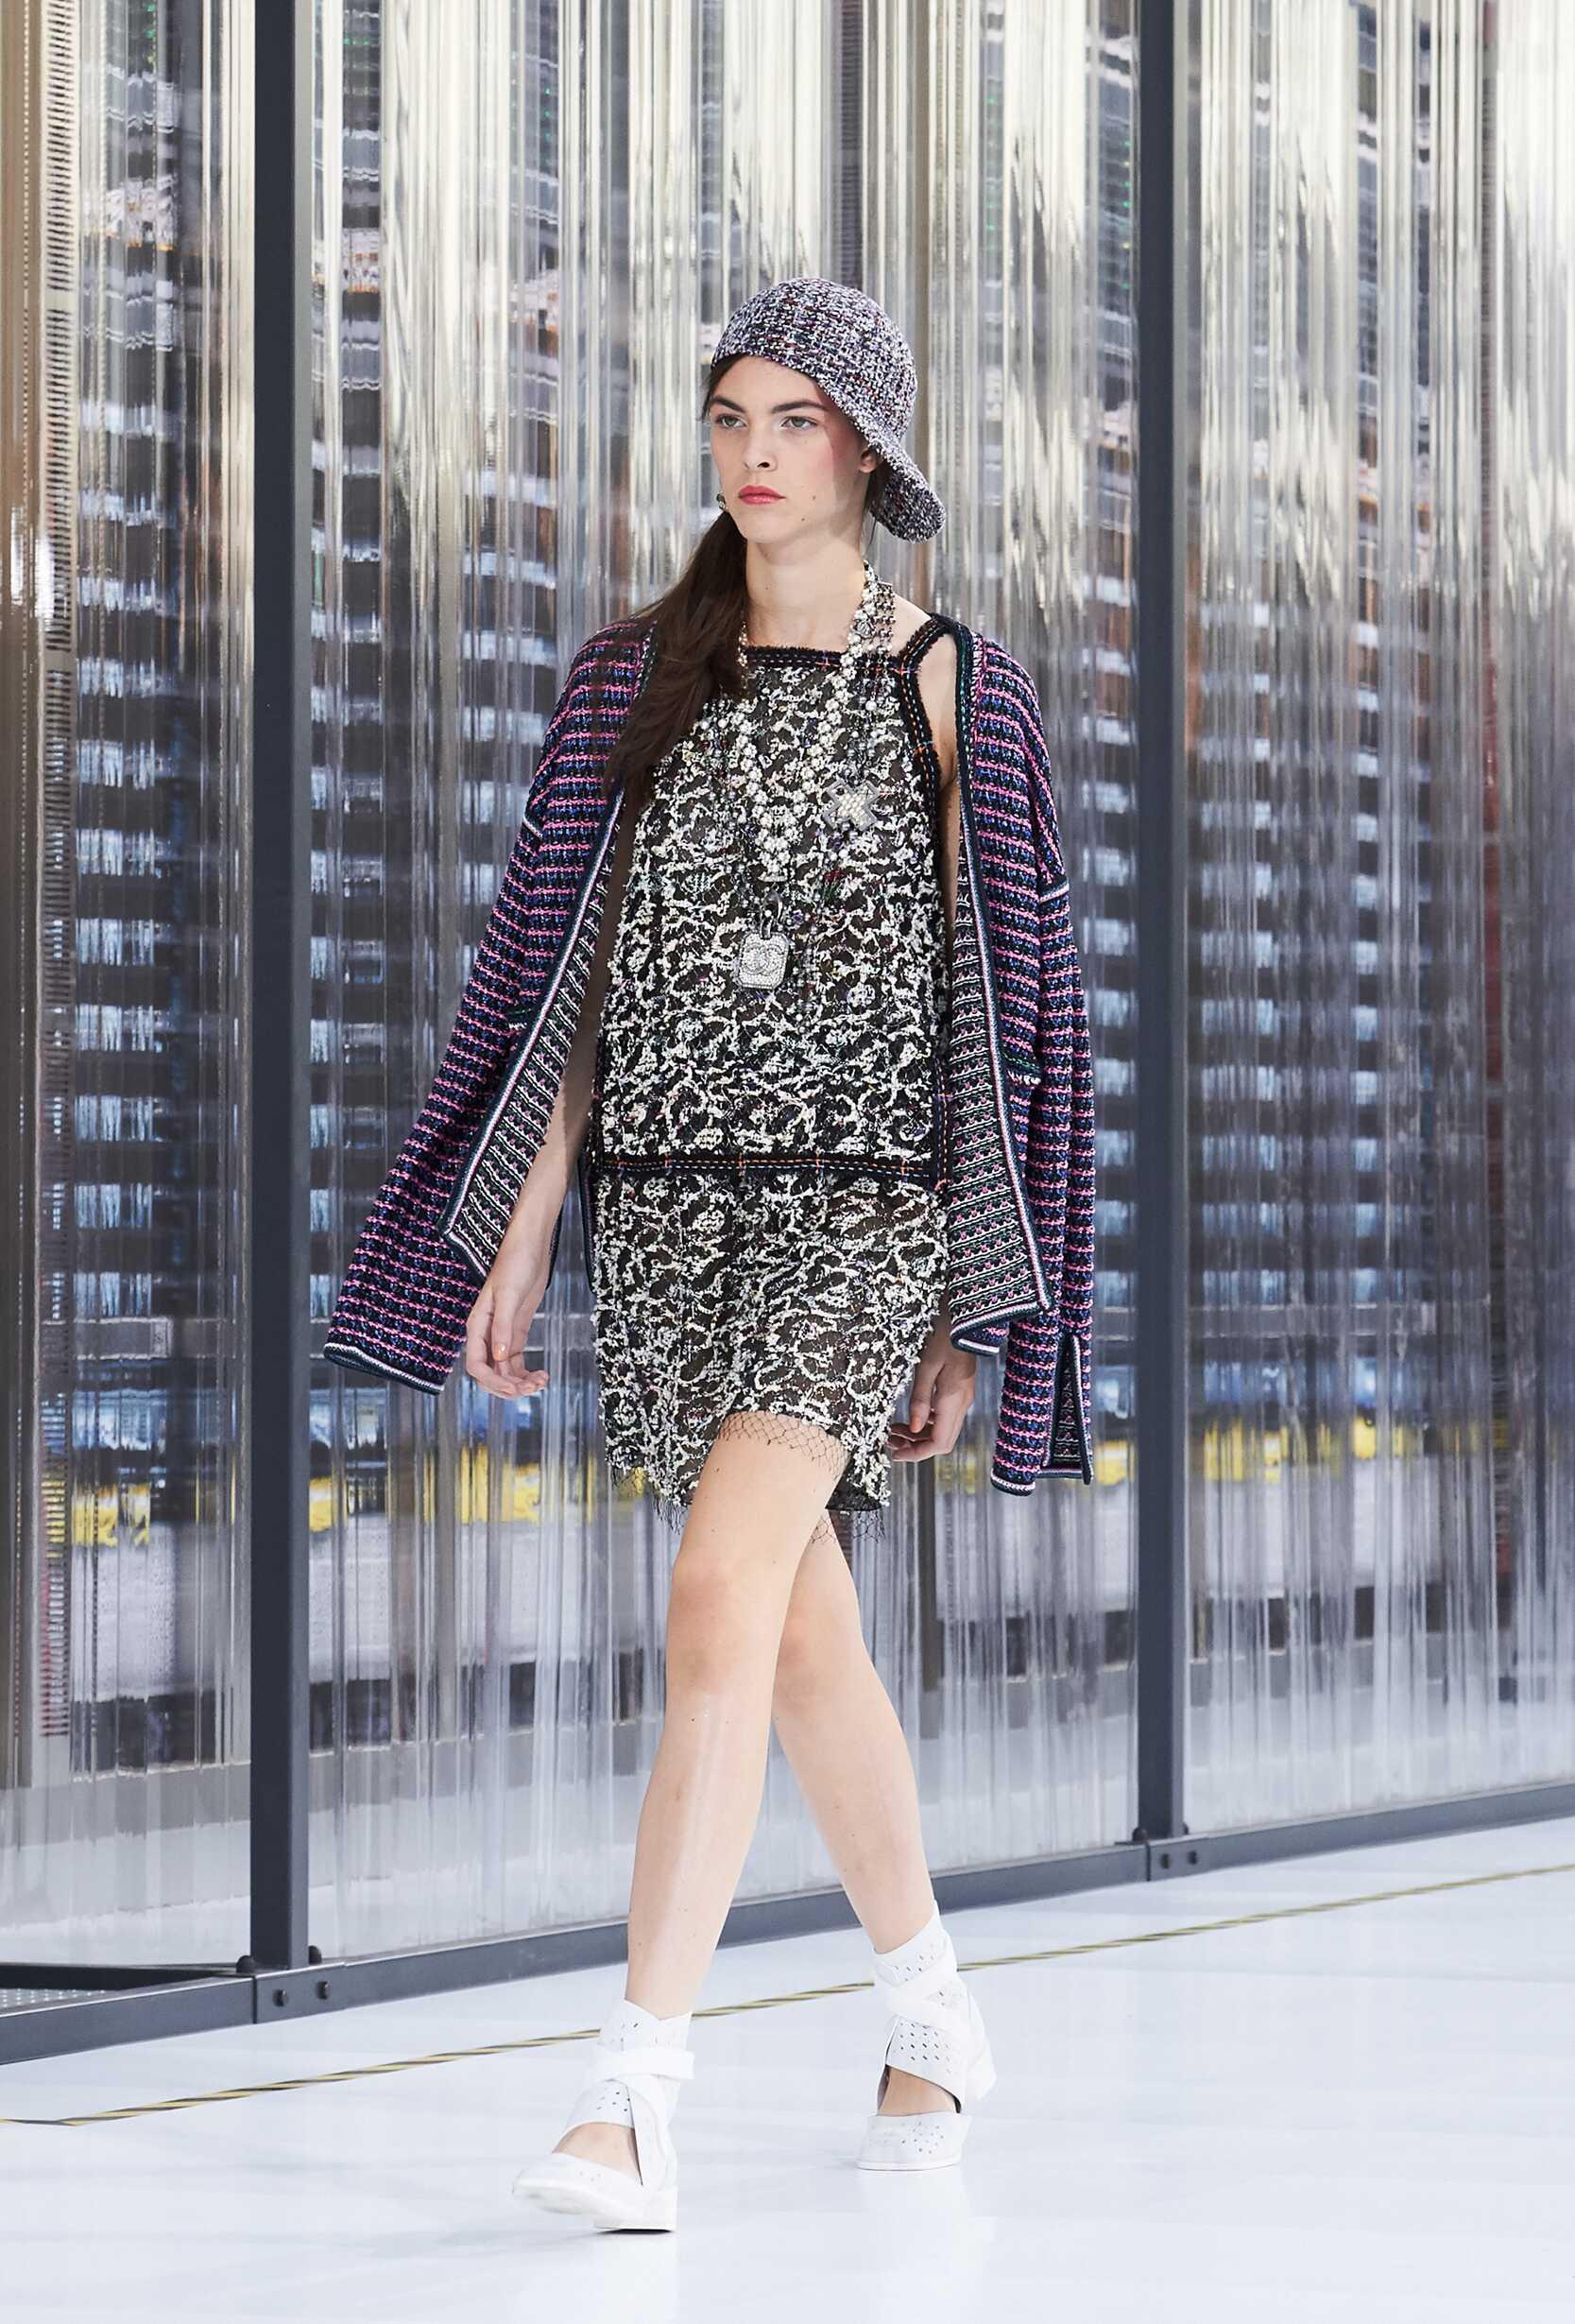 Catwalk Chanel Woman Fashion Show Summer 2017